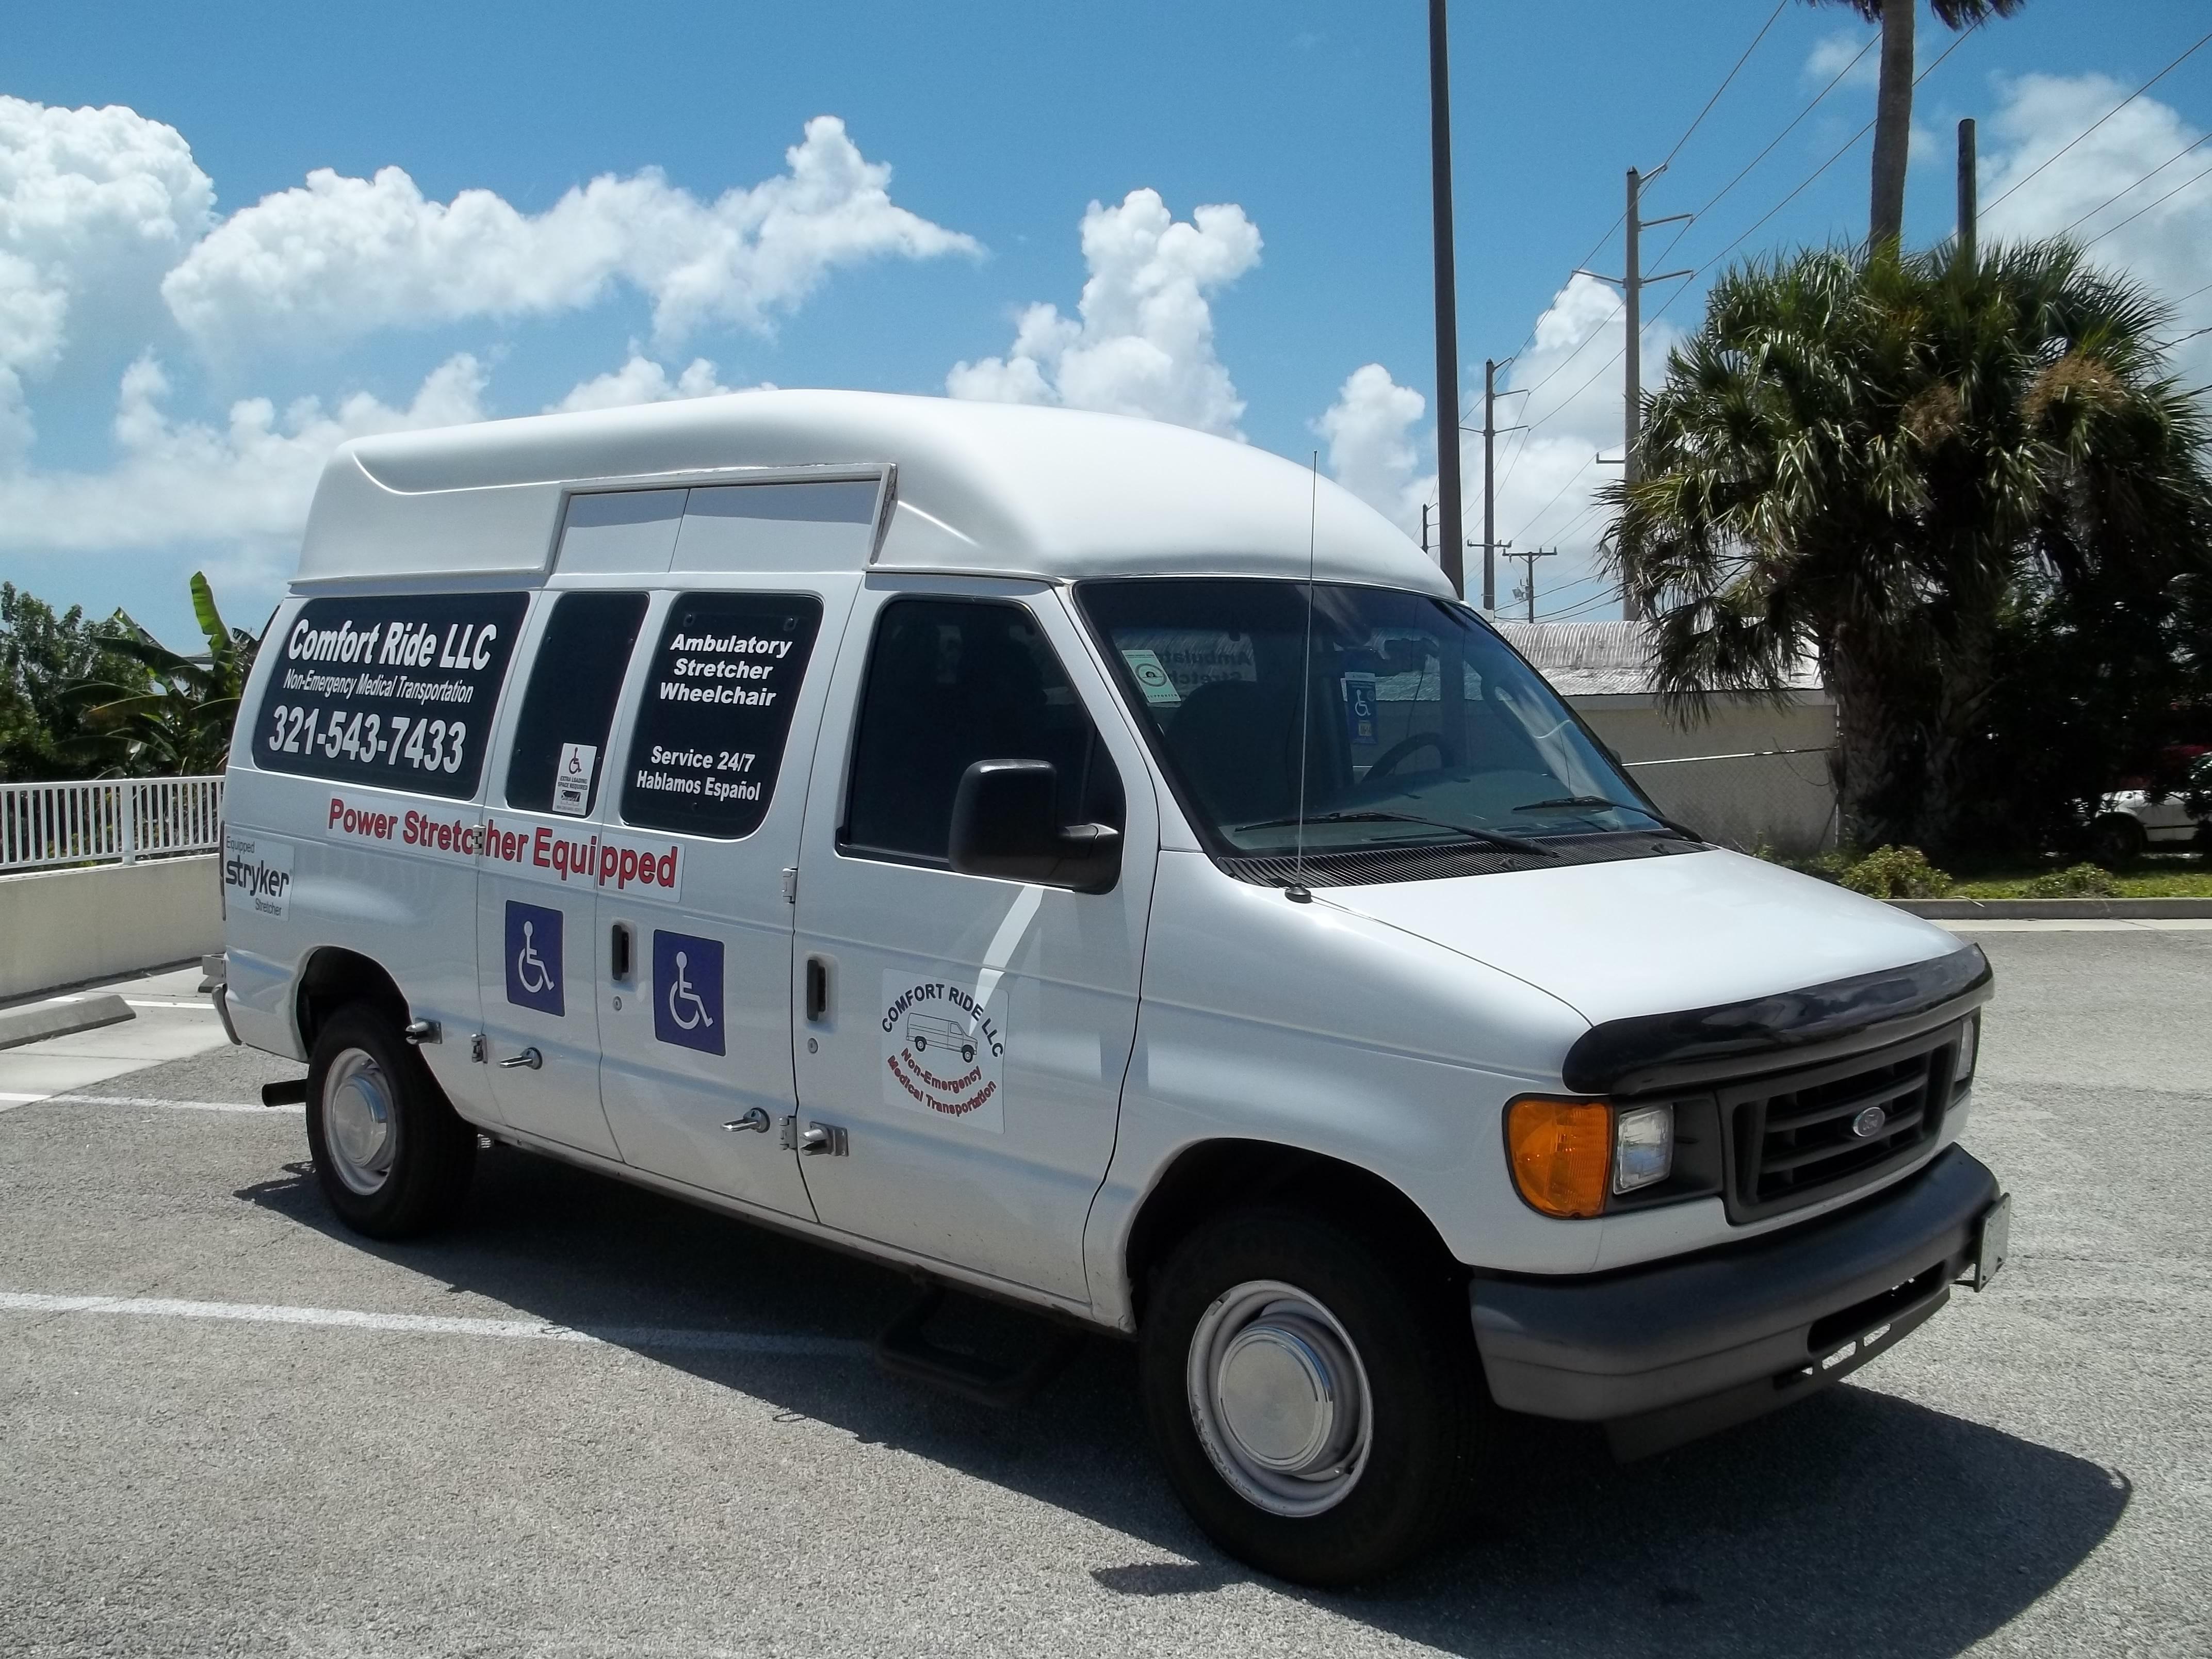 Comfort Ride LLC image 23